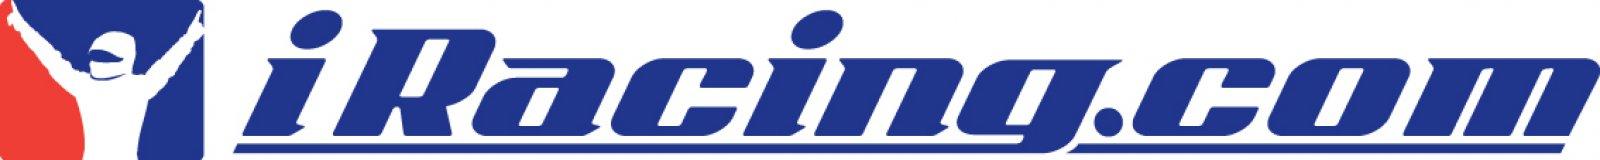 iRacing Sponsors iRacing com GT500, 2015 Blancpain Endurance